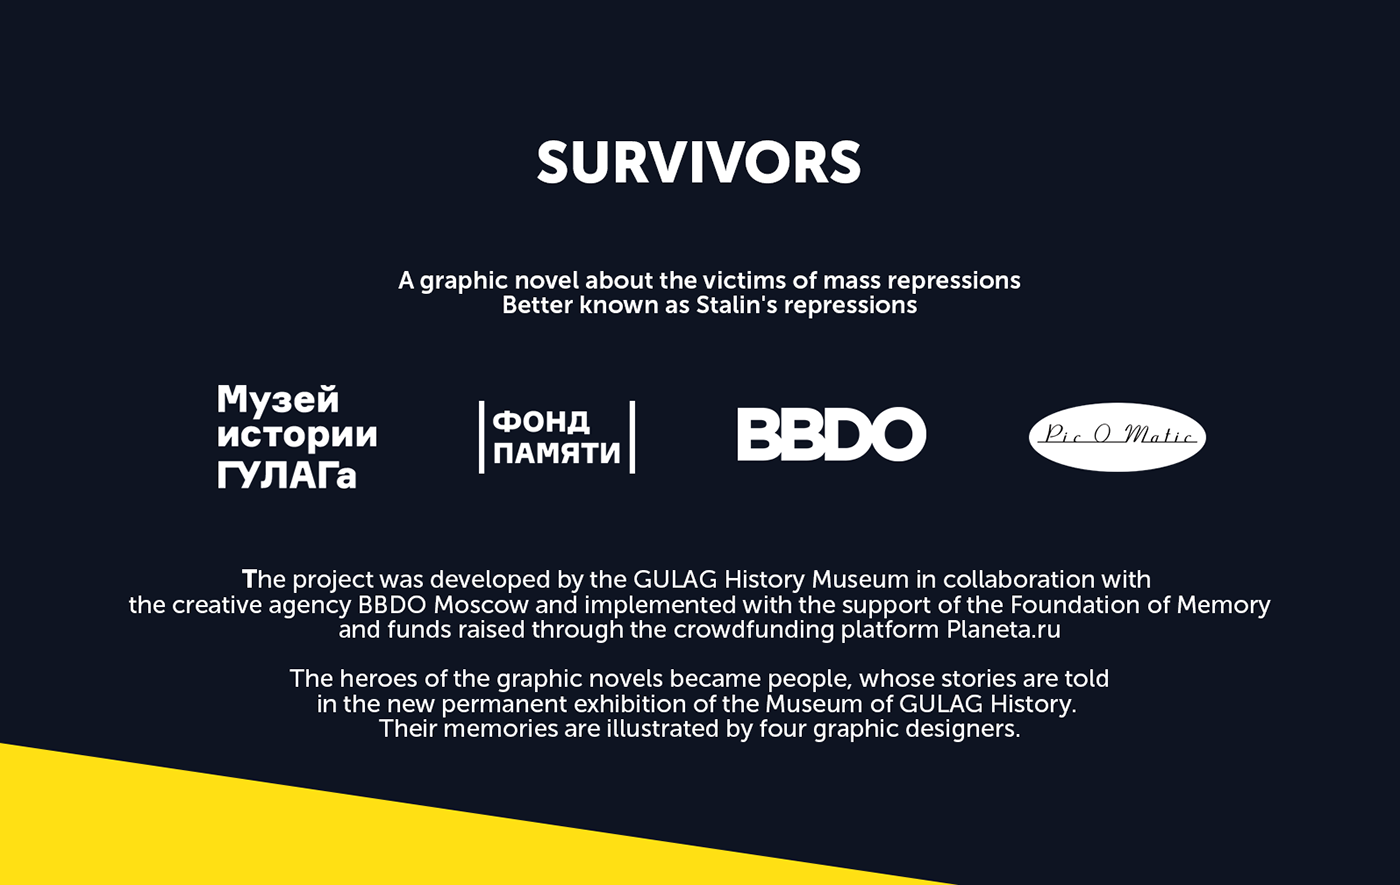 ILLUSTRATION  comics novel victim ussr gulag repression murder suffer hope